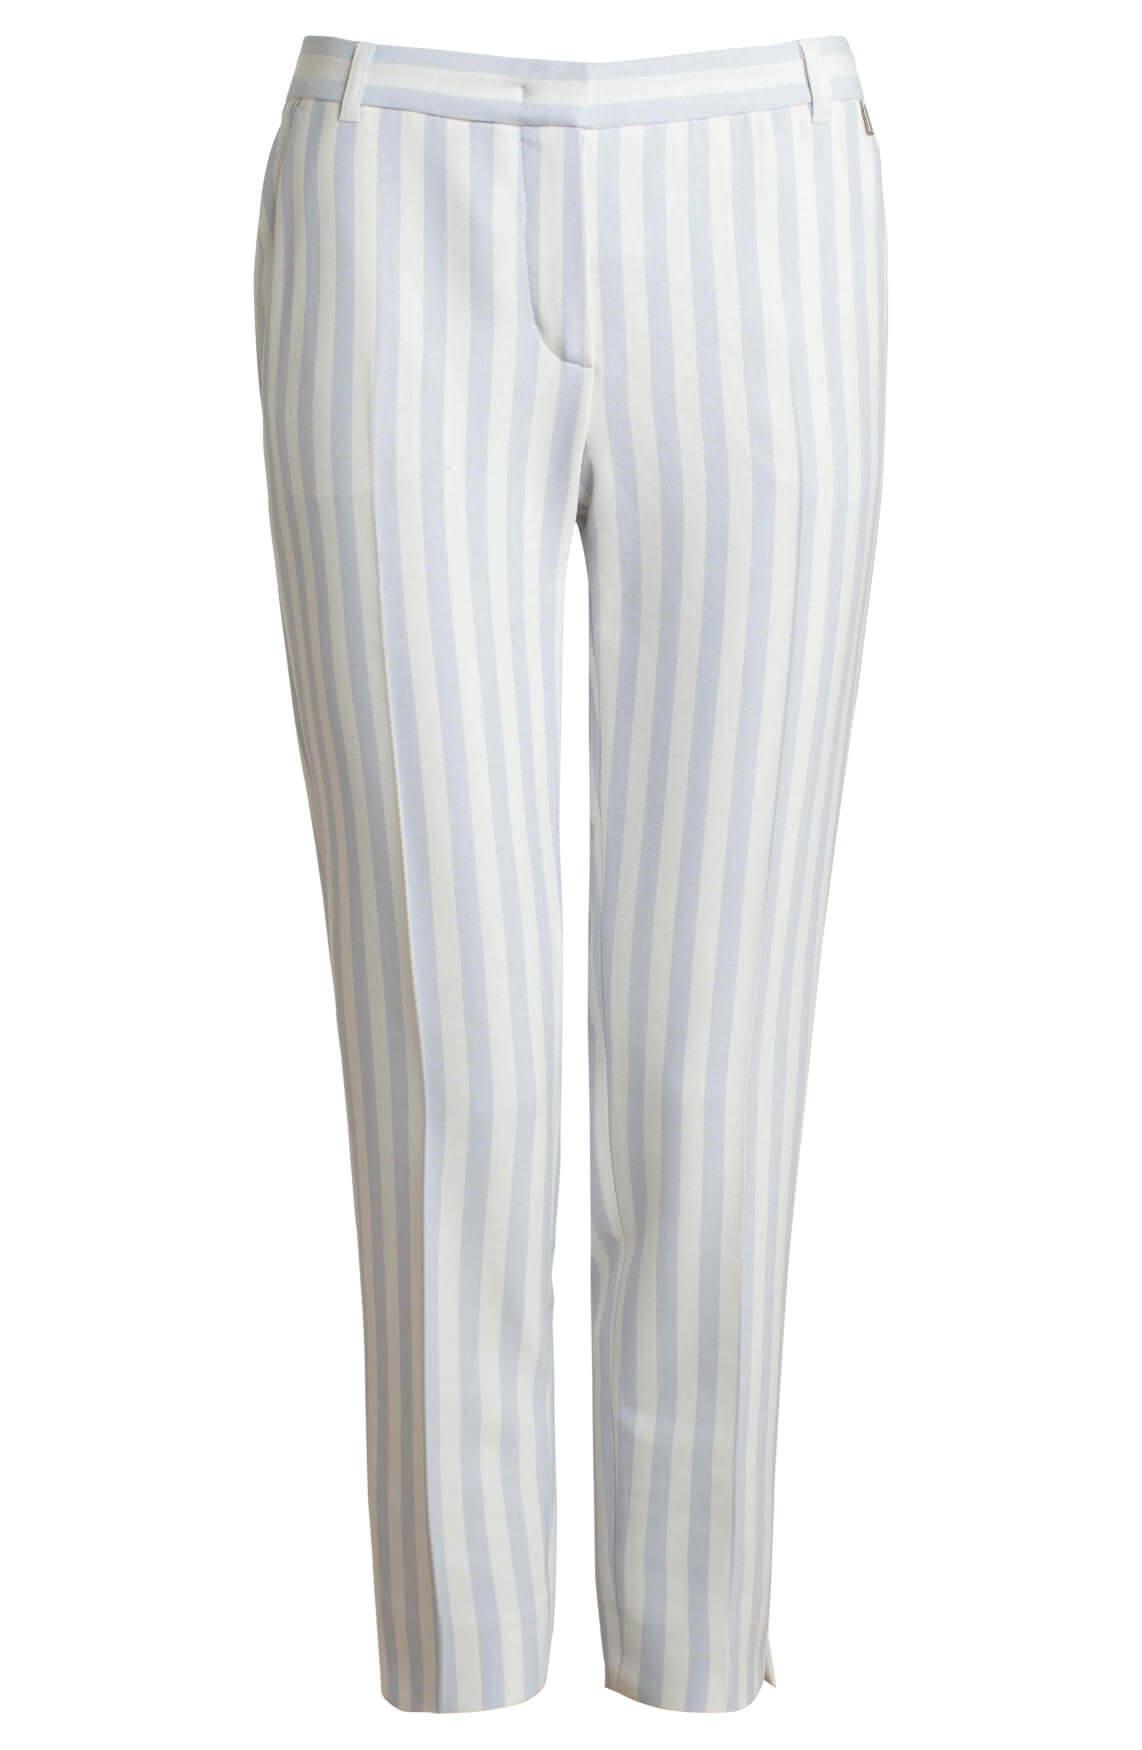 Anna Dames Gestreepte pantalon Blauw